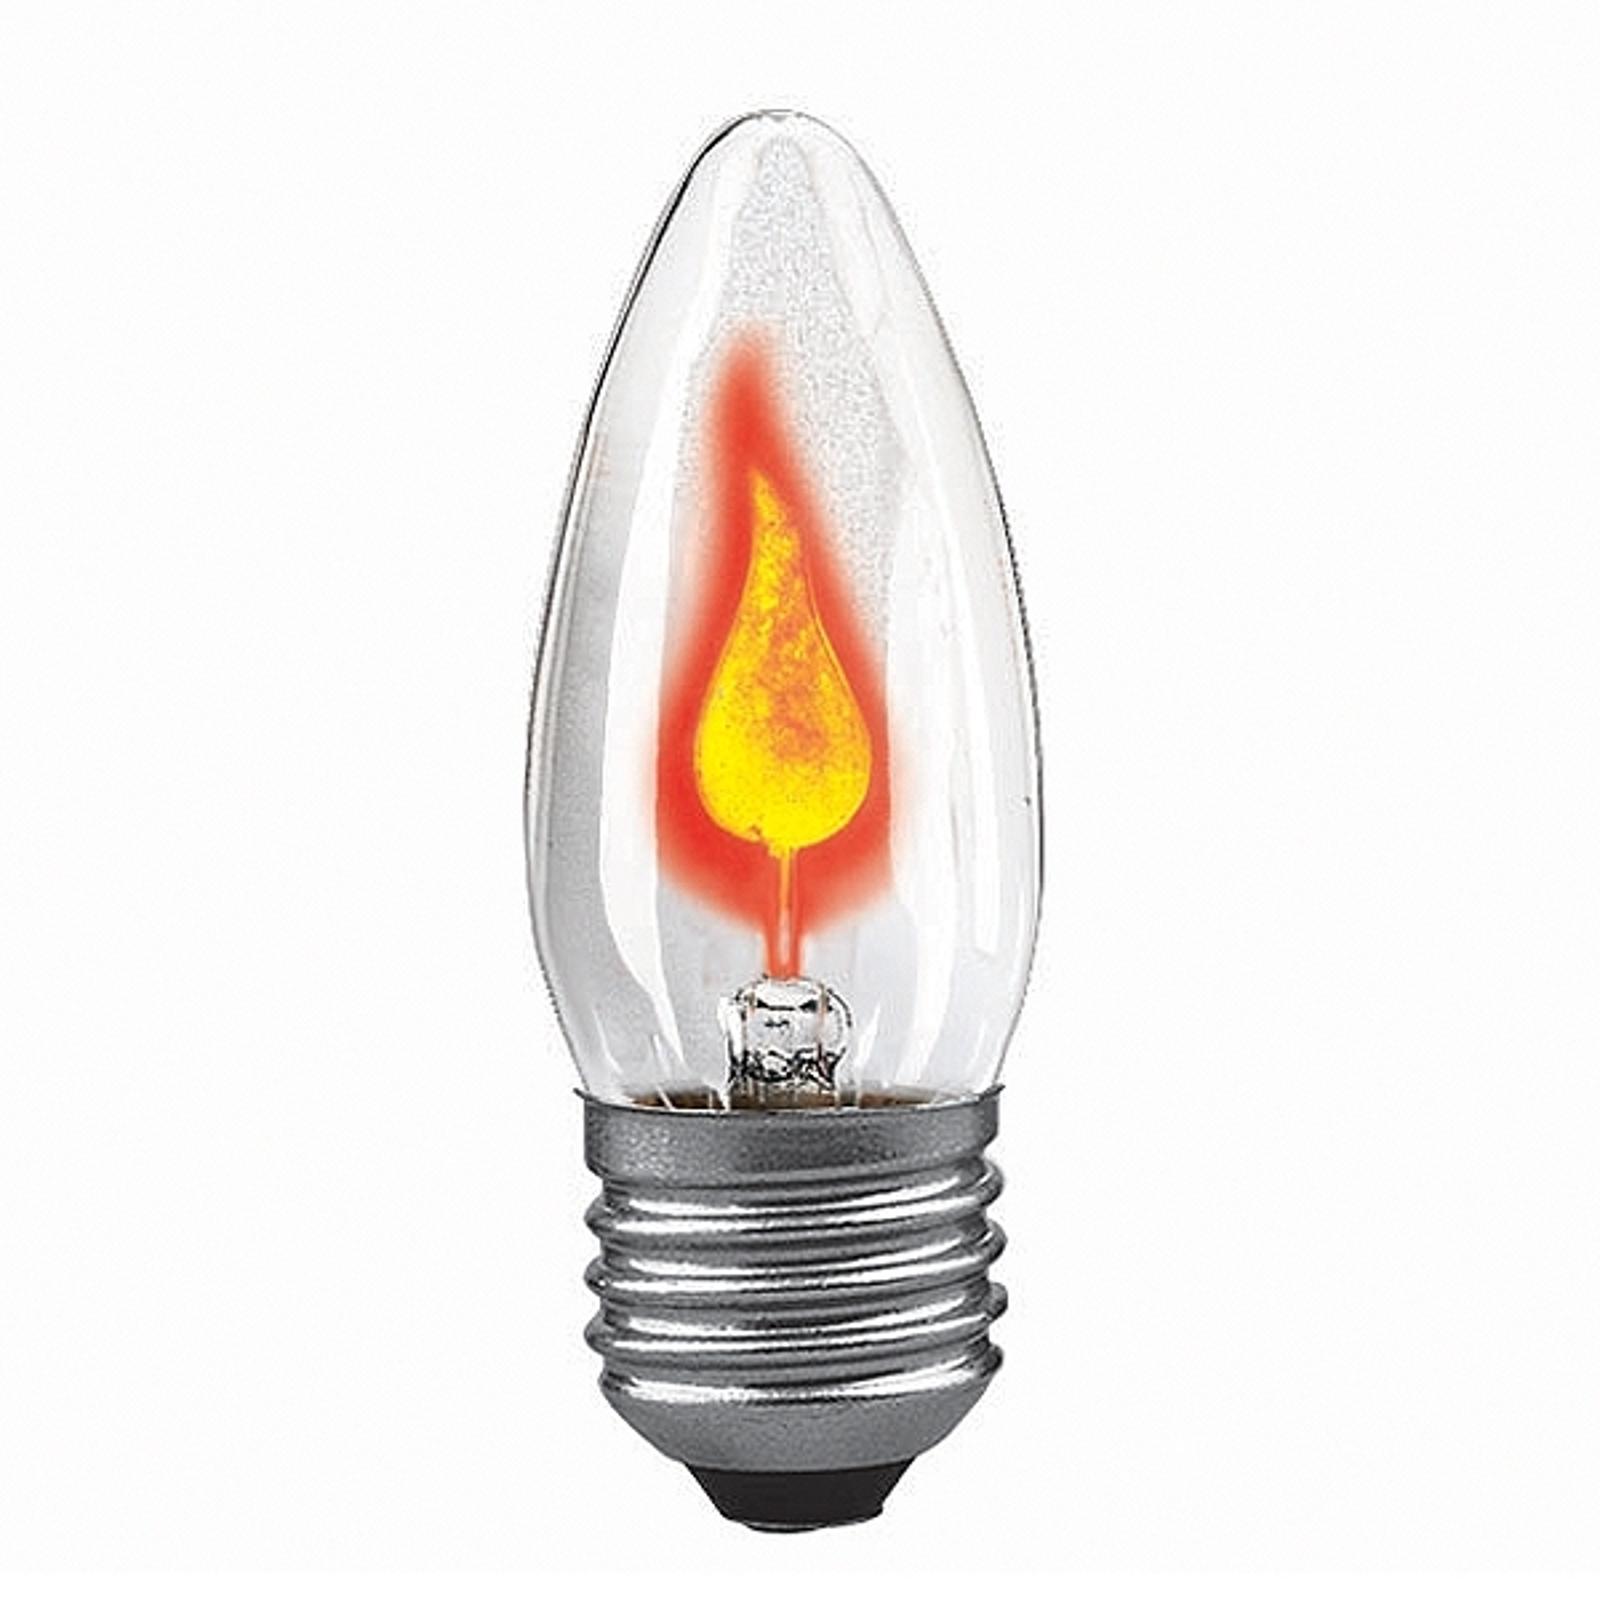 Paulmann E27 svíčková žárovka 3W čirá